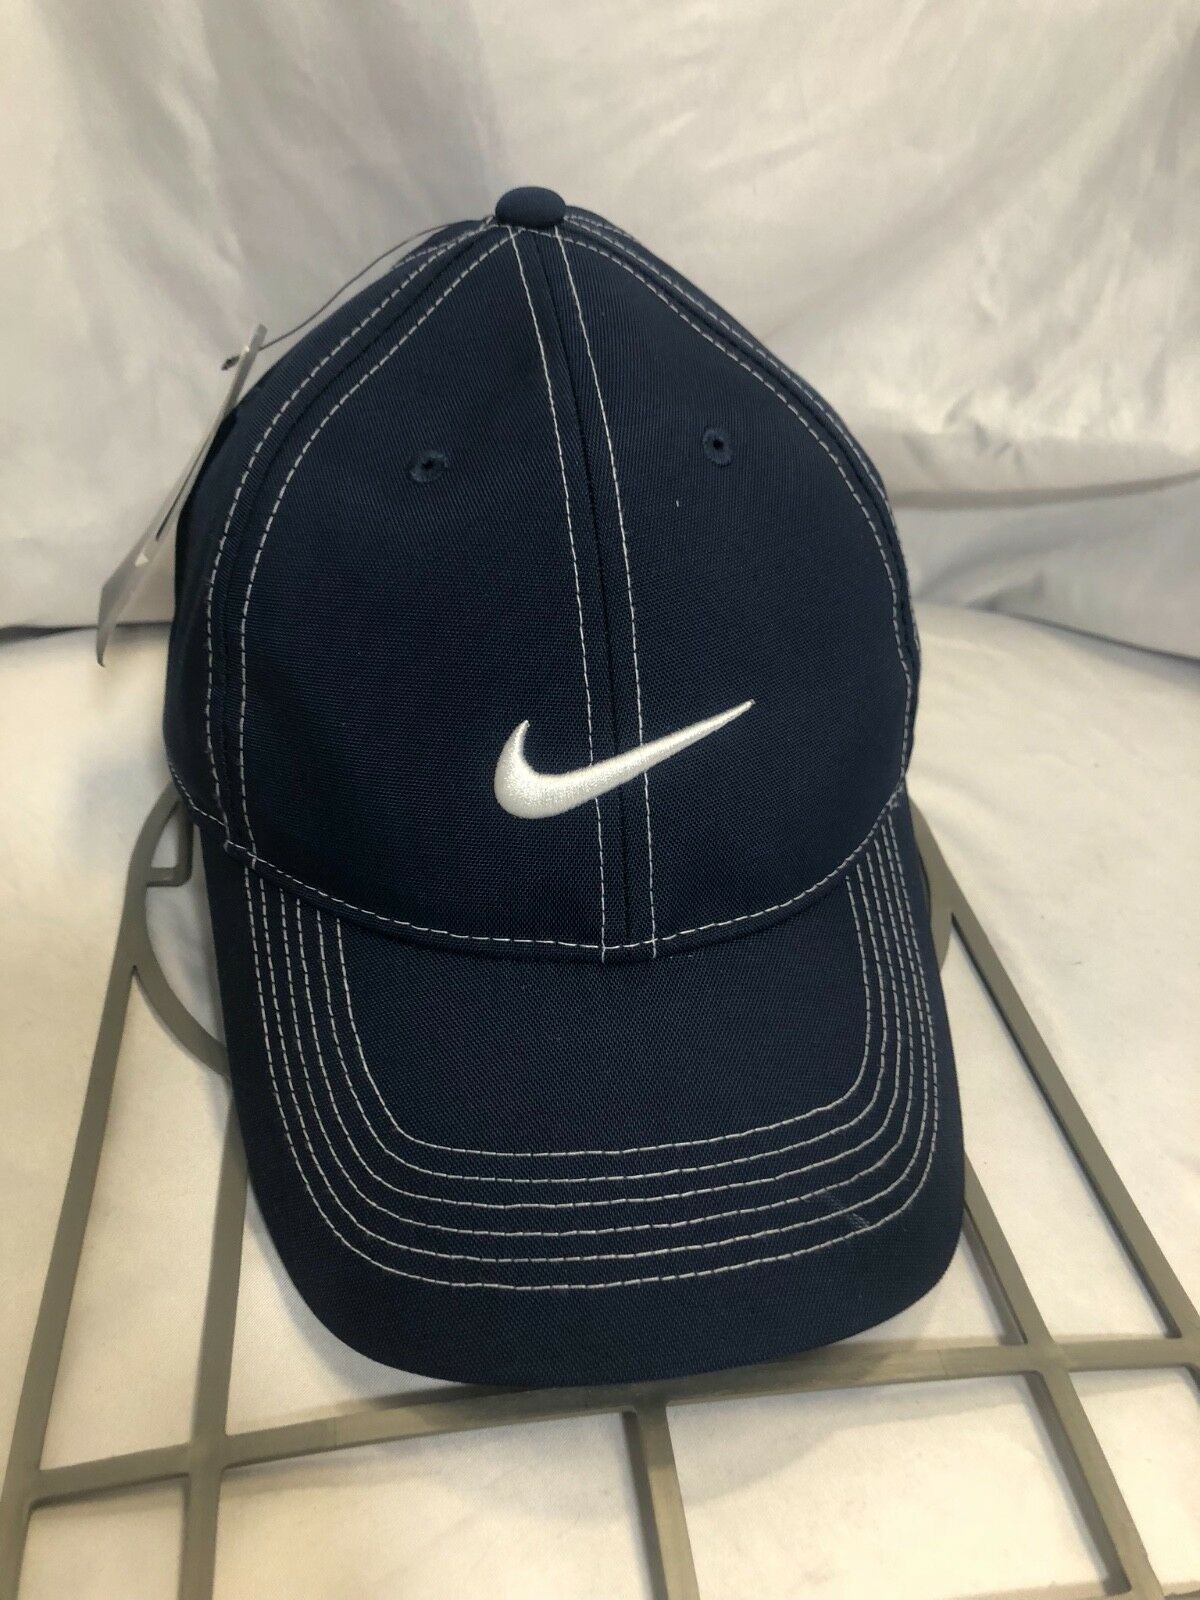 NWT Nike Golf Athletic Stay Cool DRI-FIT Navy Hat Blue White Stitch Unisex Hat Navy Cap 5fa334